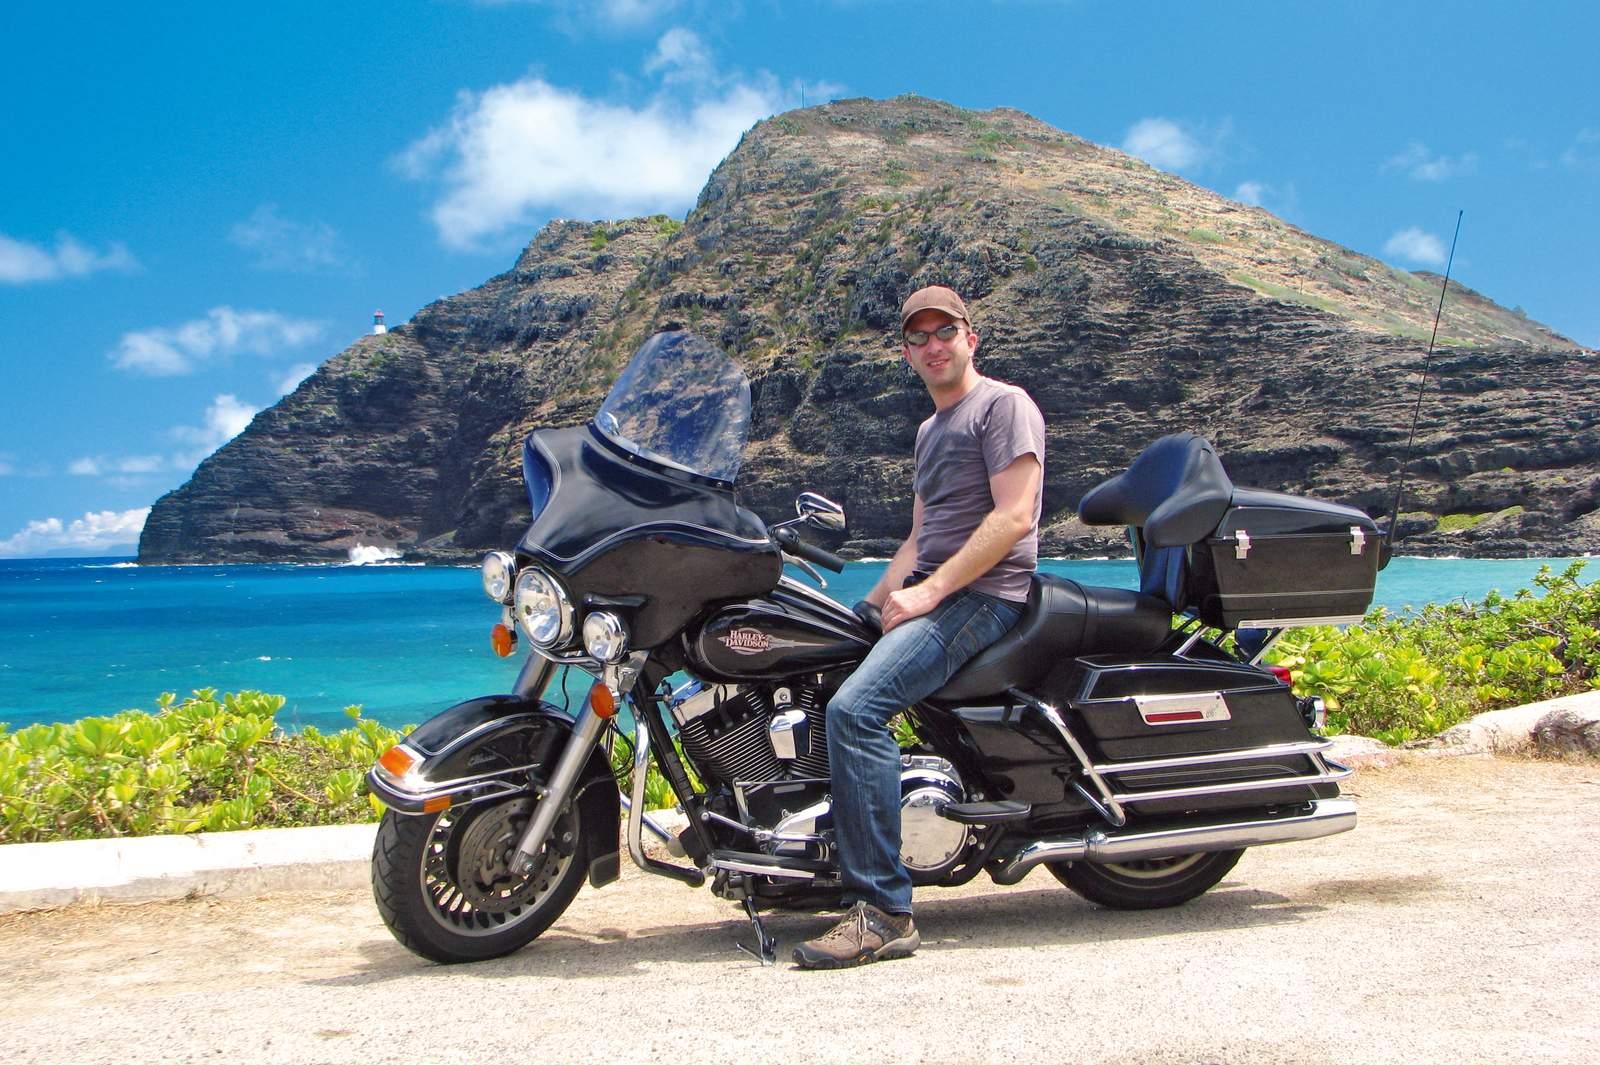 Mit dem Motorrad Oahu entdecken